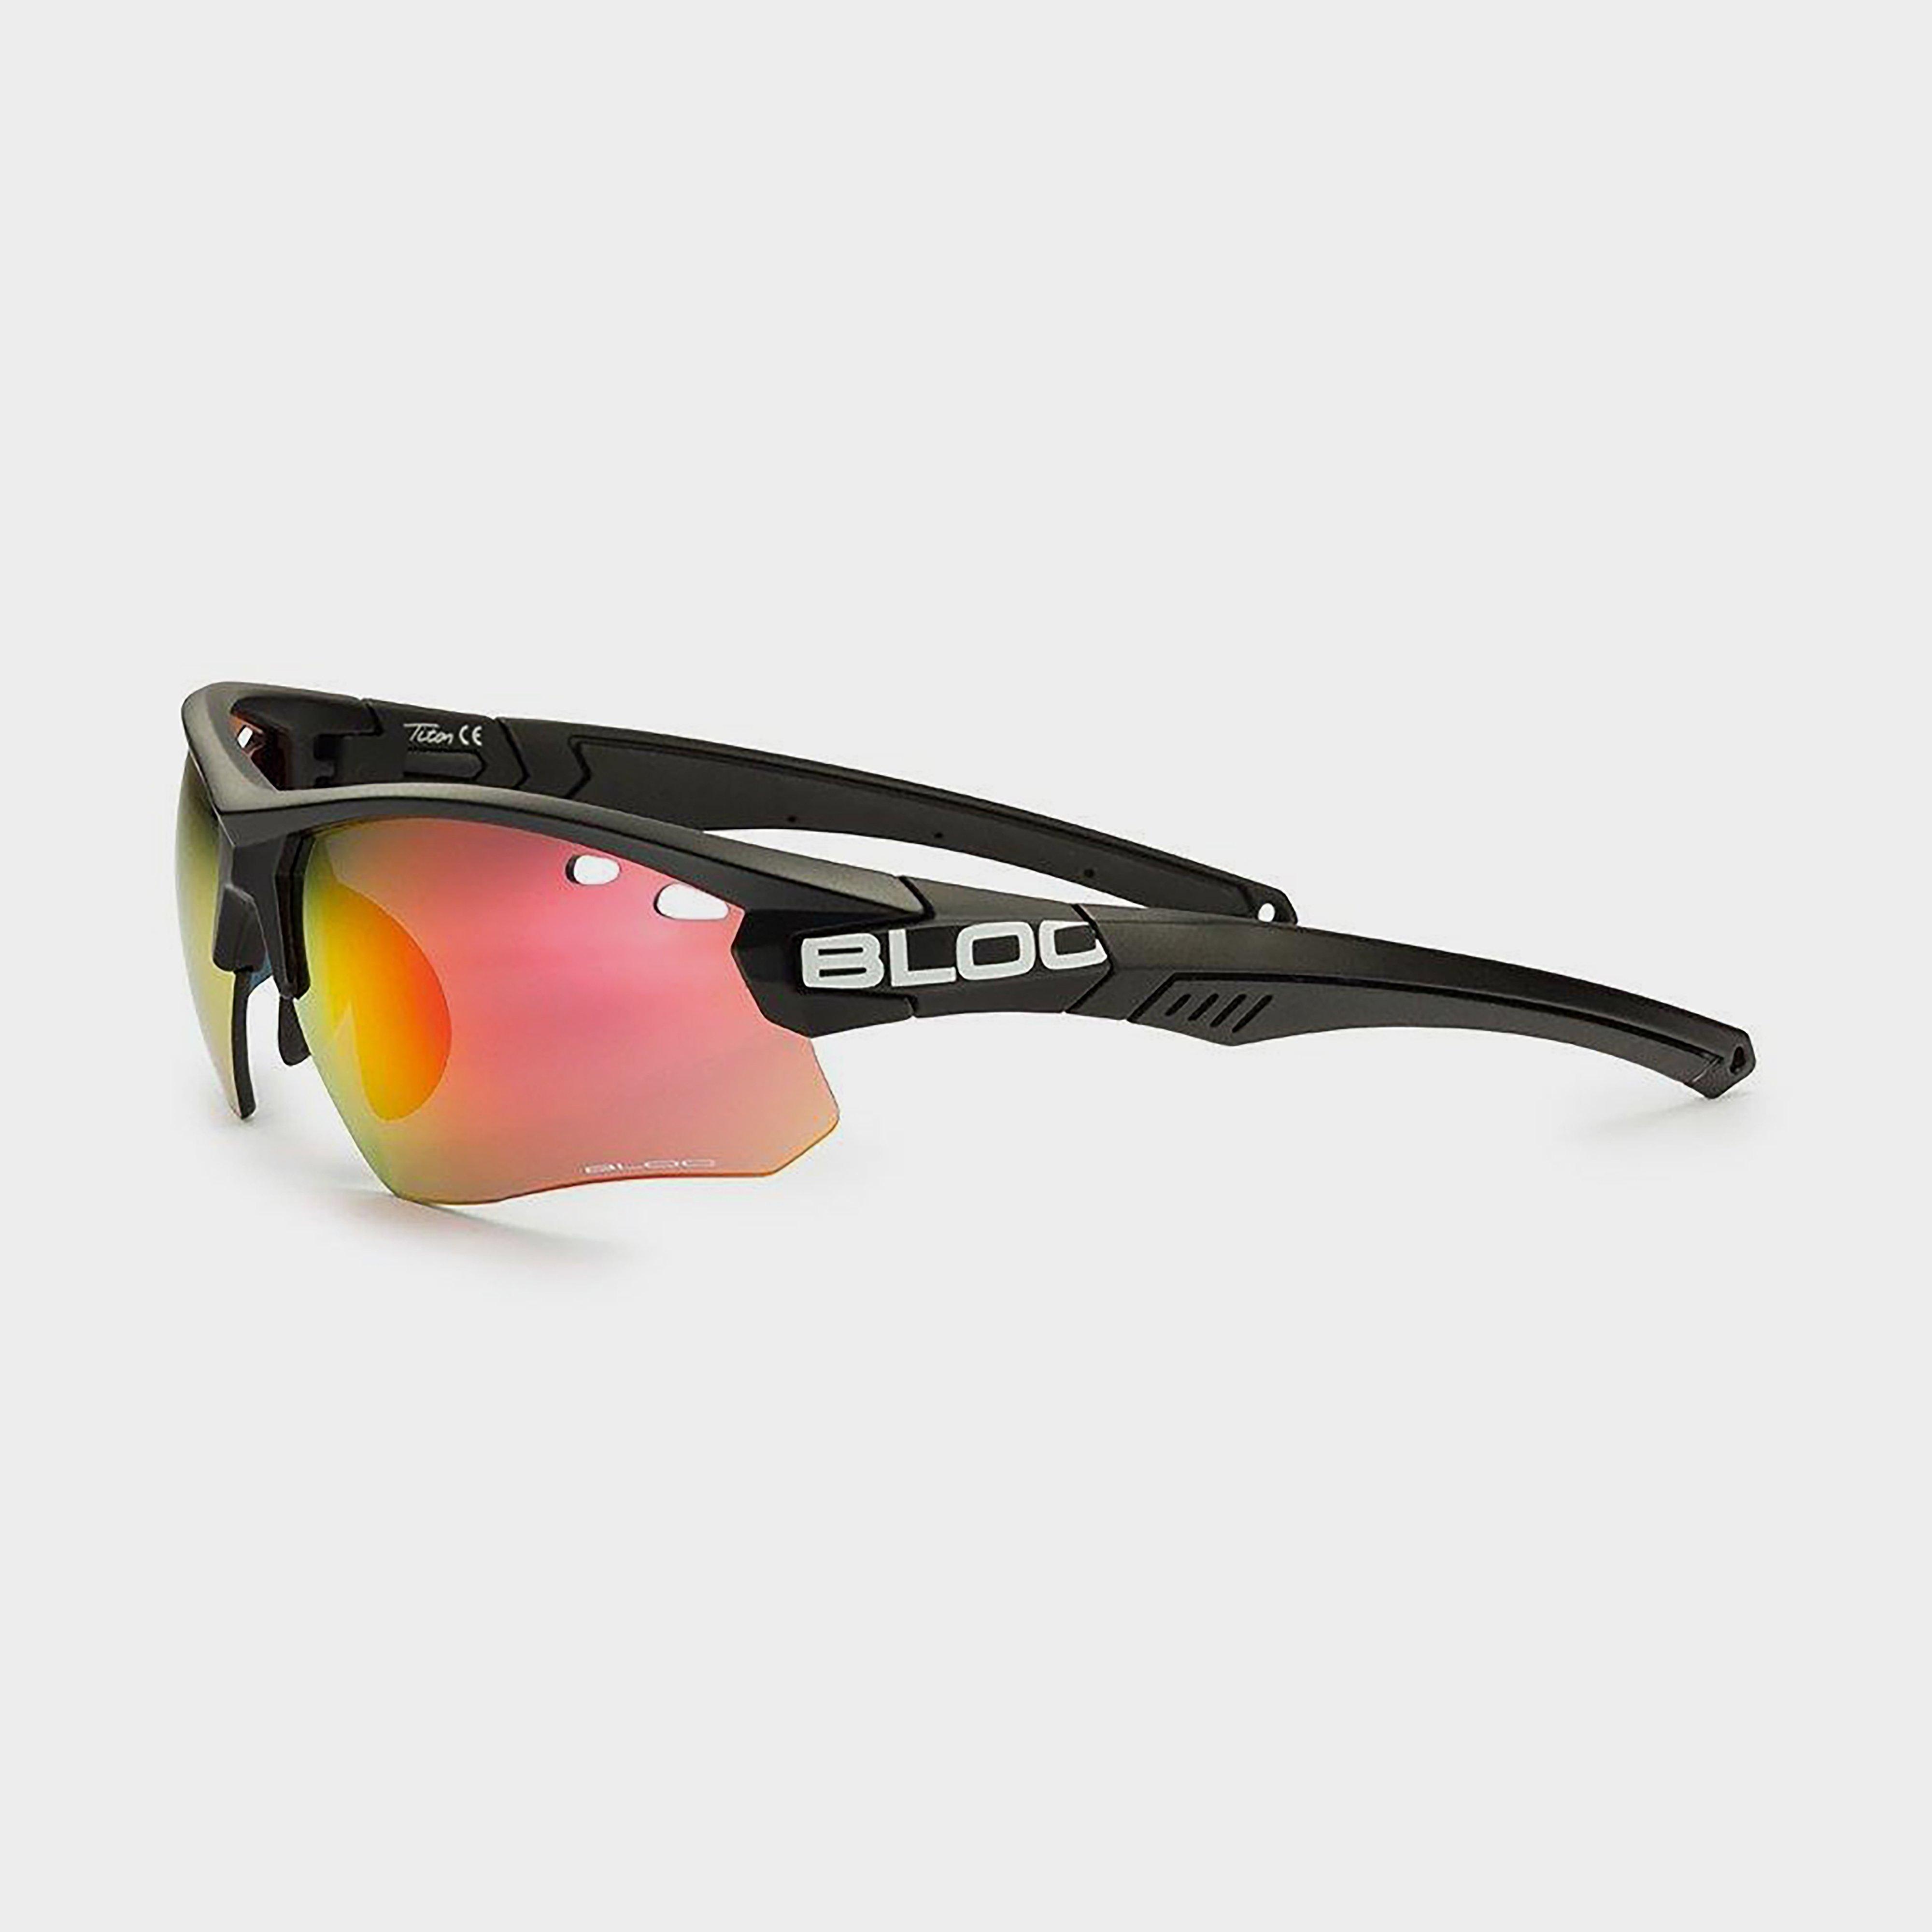 Bloc Titan Xr630 Sunglasses - Black/blk/rd  Black/blk/rd